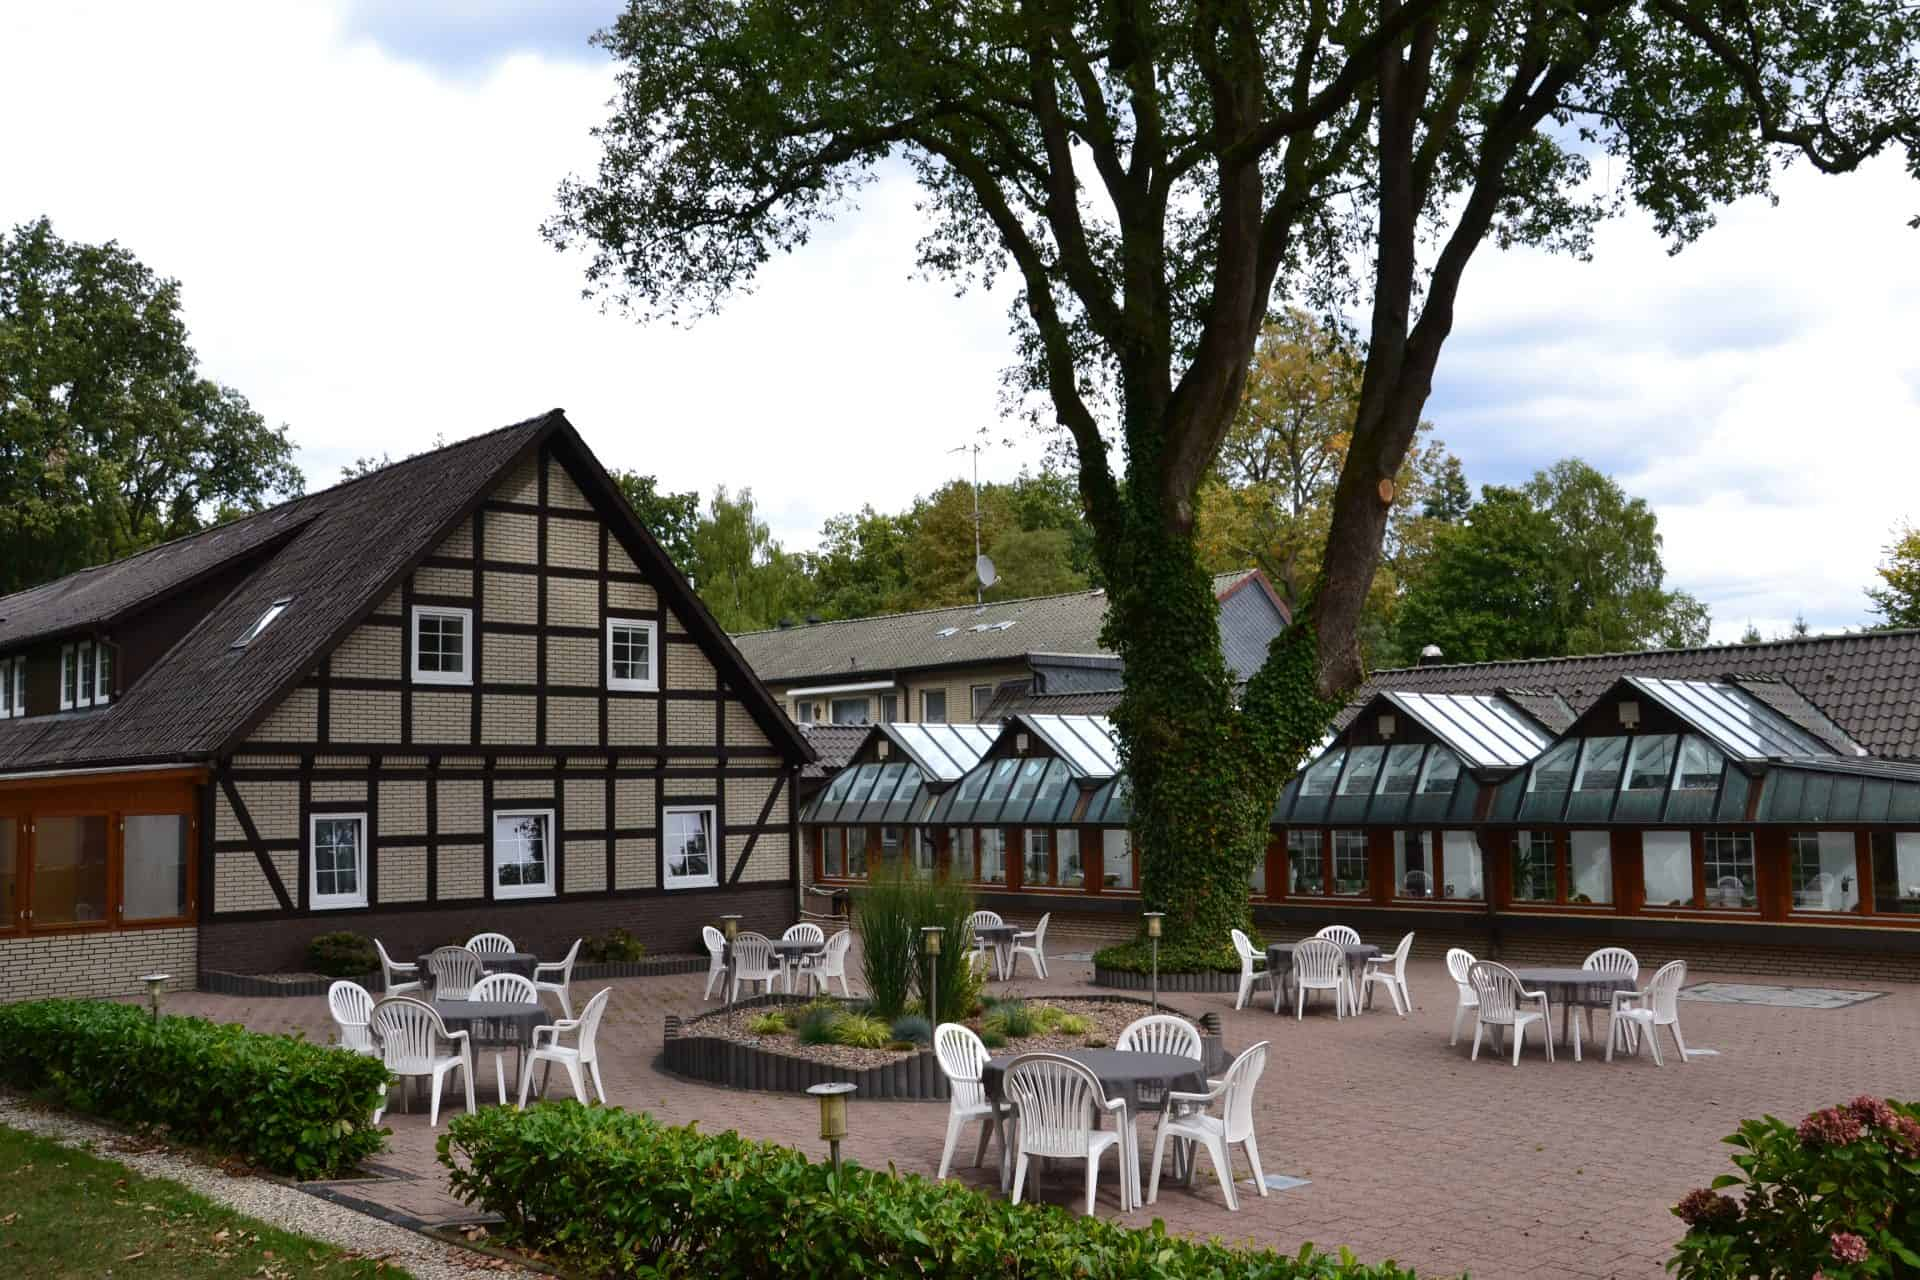 Kaffeegarten - Hotel Restaurant Café Hof Barrl, Schneverdingen